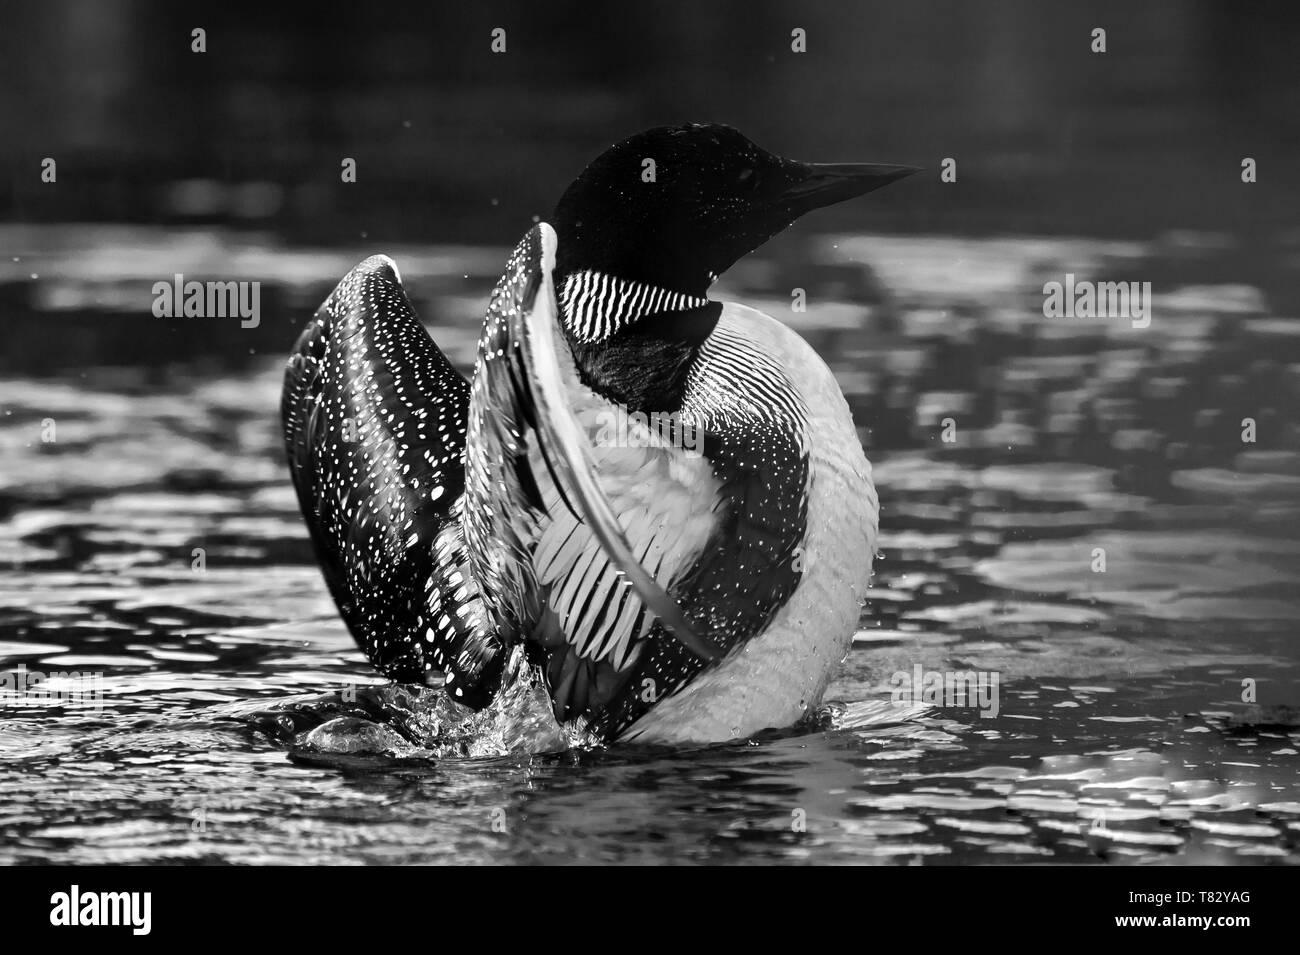 Common Loon Photos - Stock Image